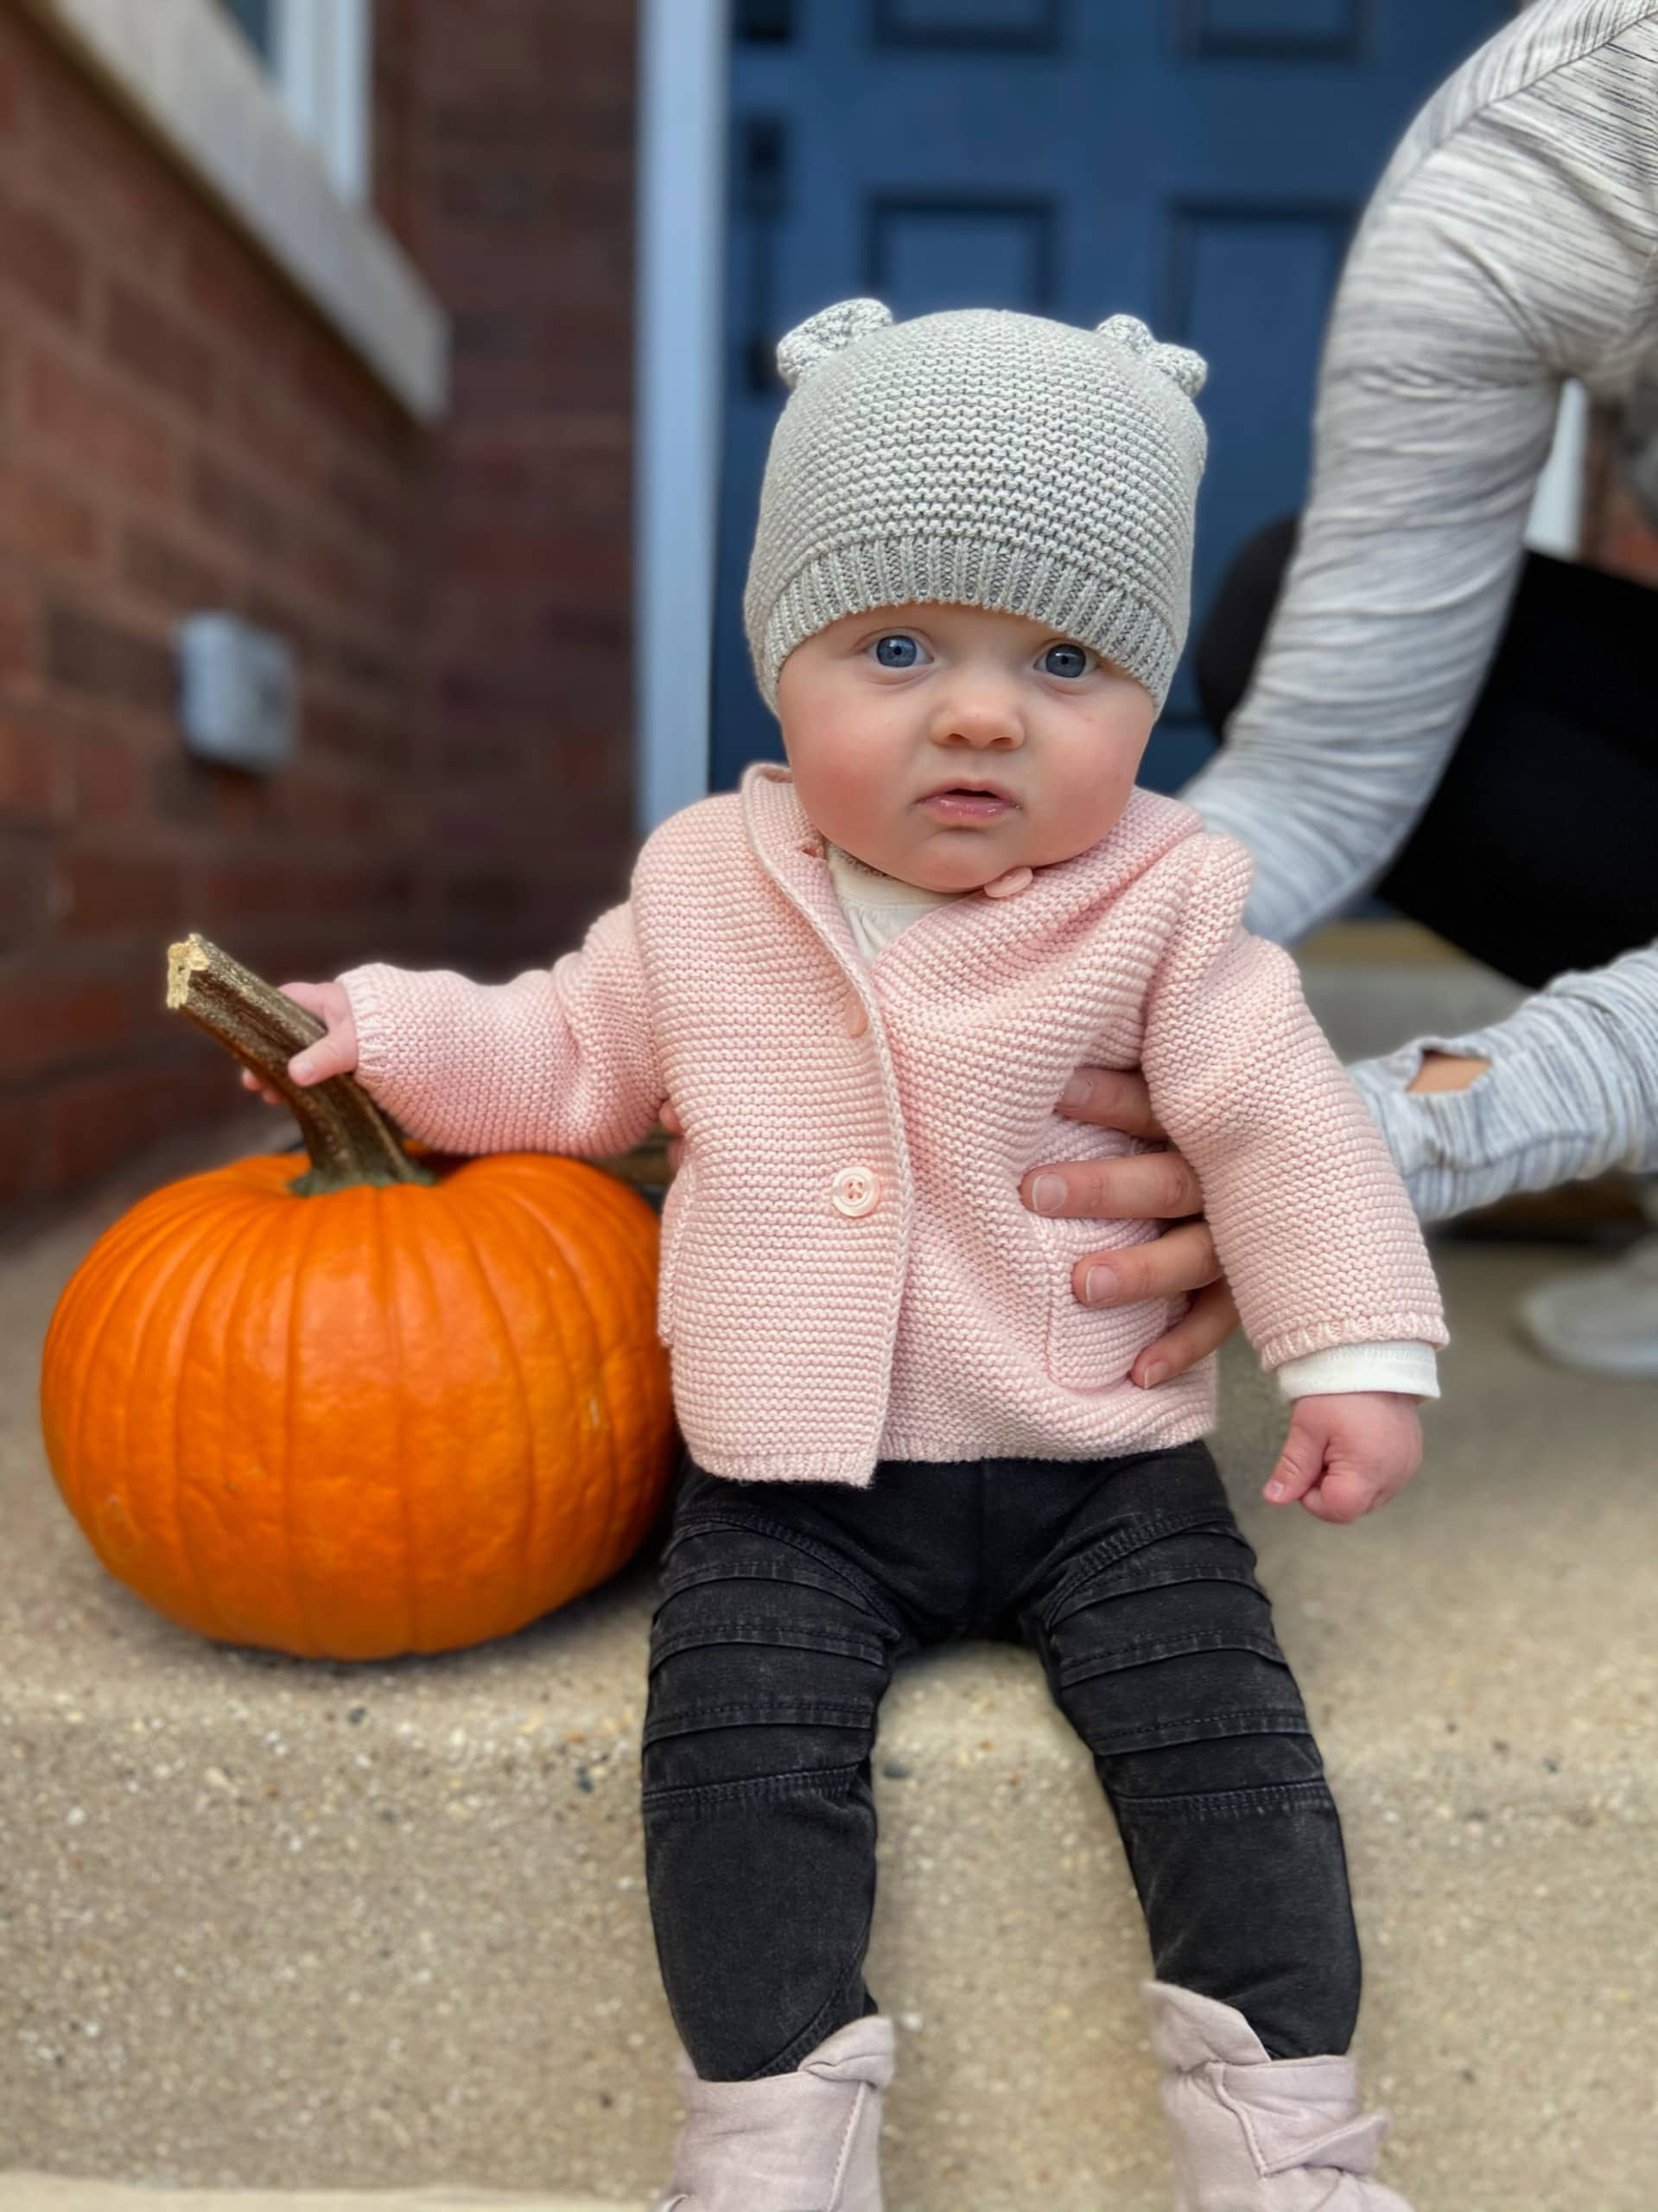 Rory's first pumpkin